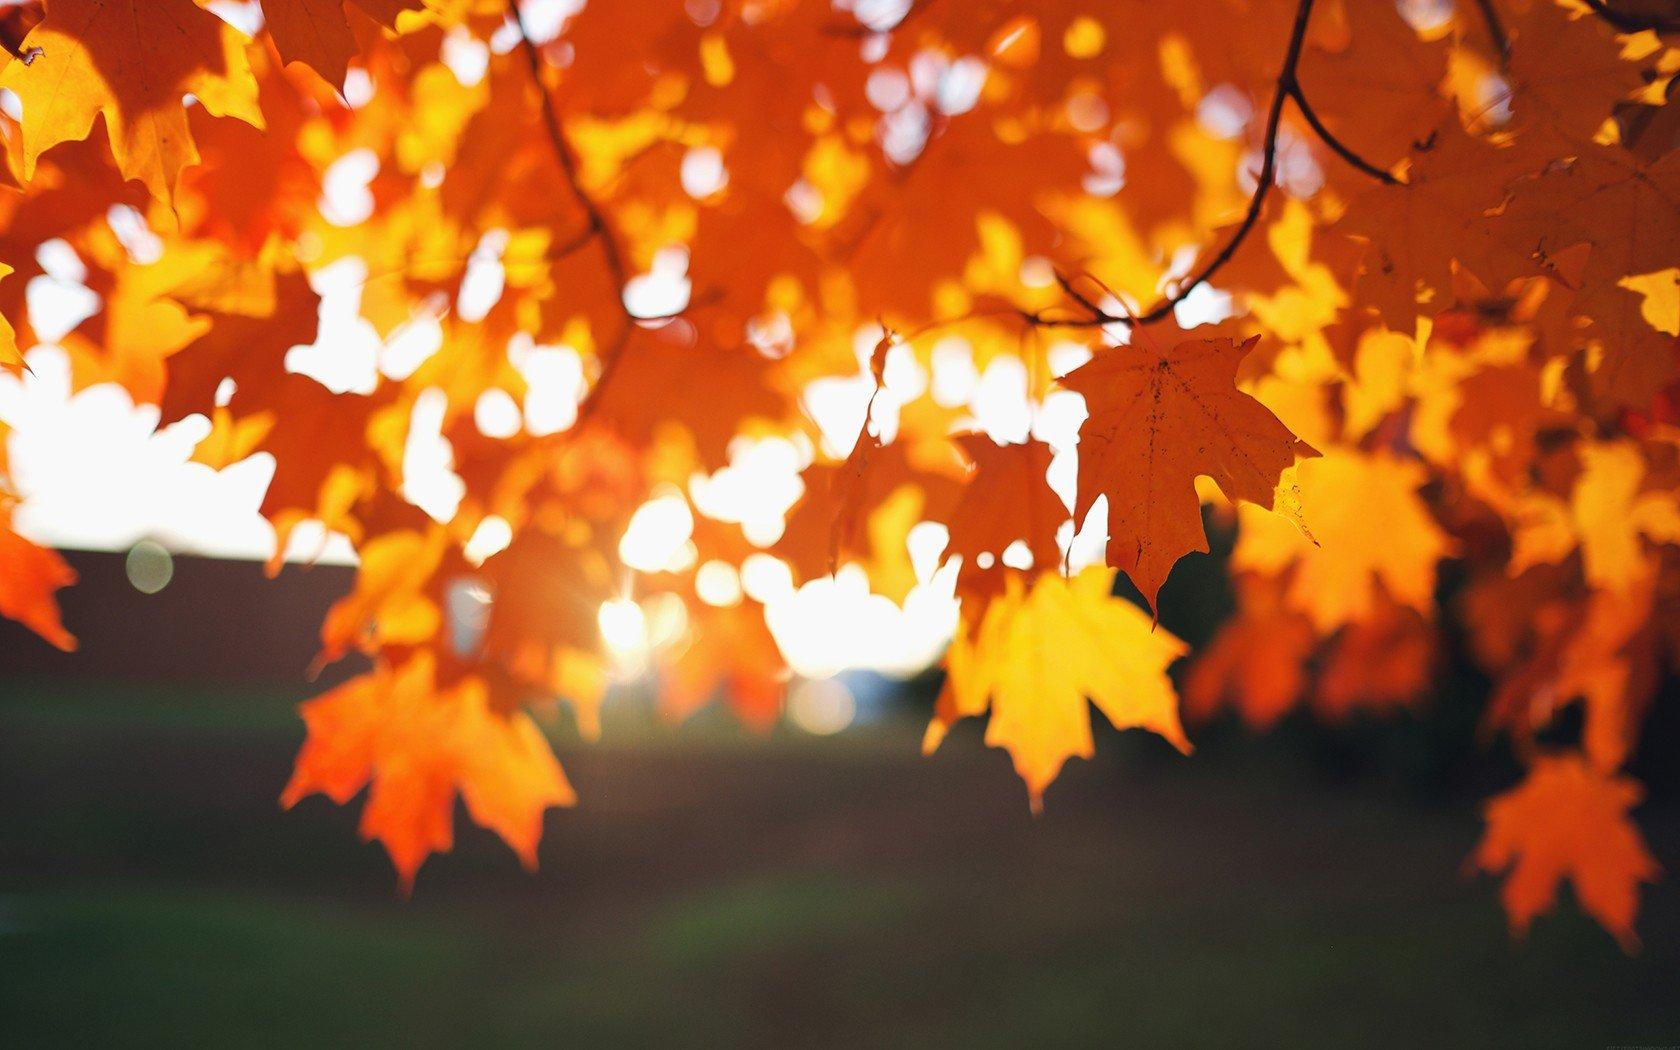 Autumn Fall Wallpaper 1600x900 Leaves Sunlight Depth Of Field Photography Bokeh Fall